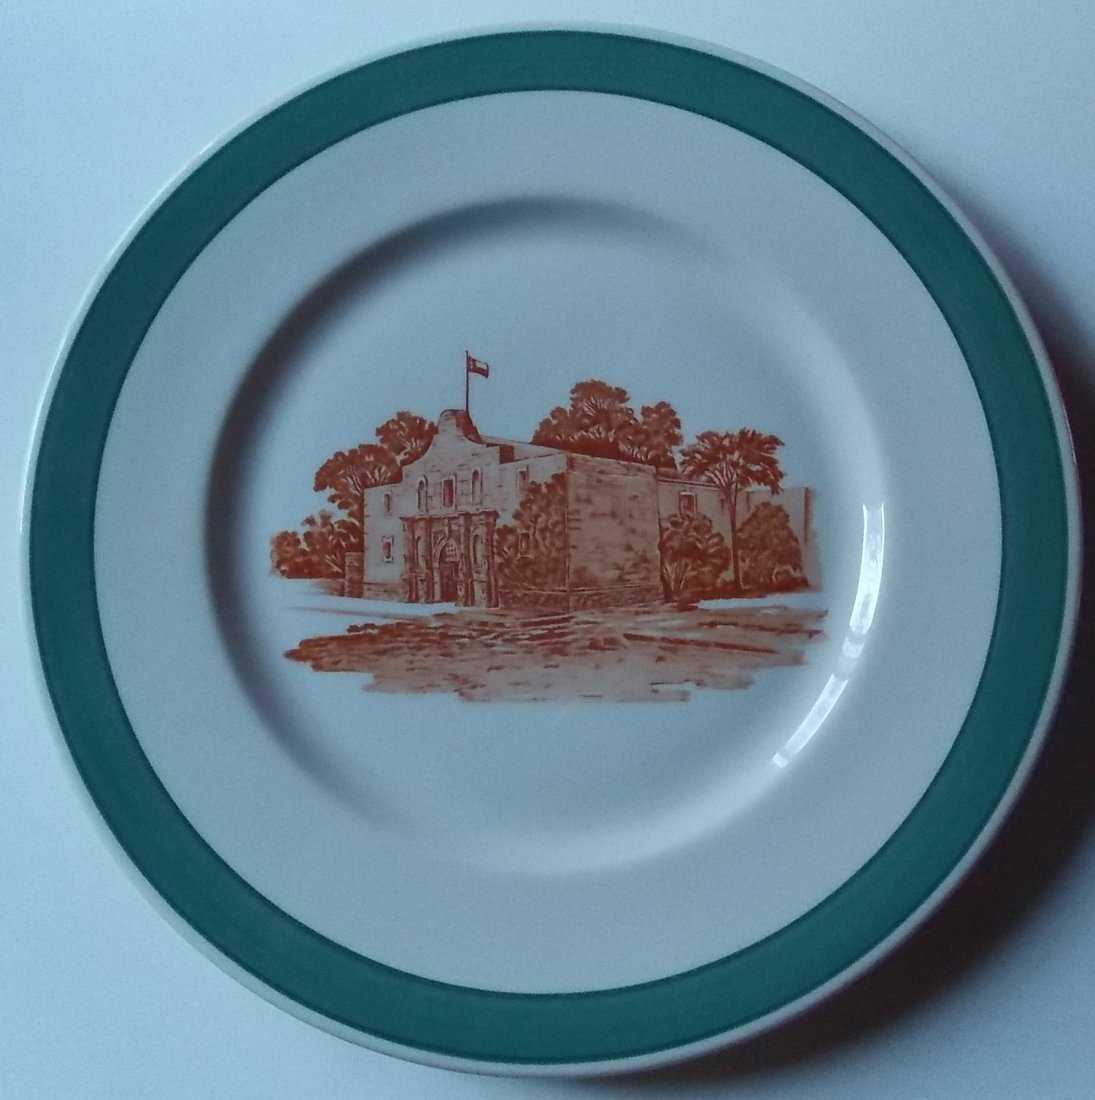 MK&T Green Alamo Service Plate – Katy